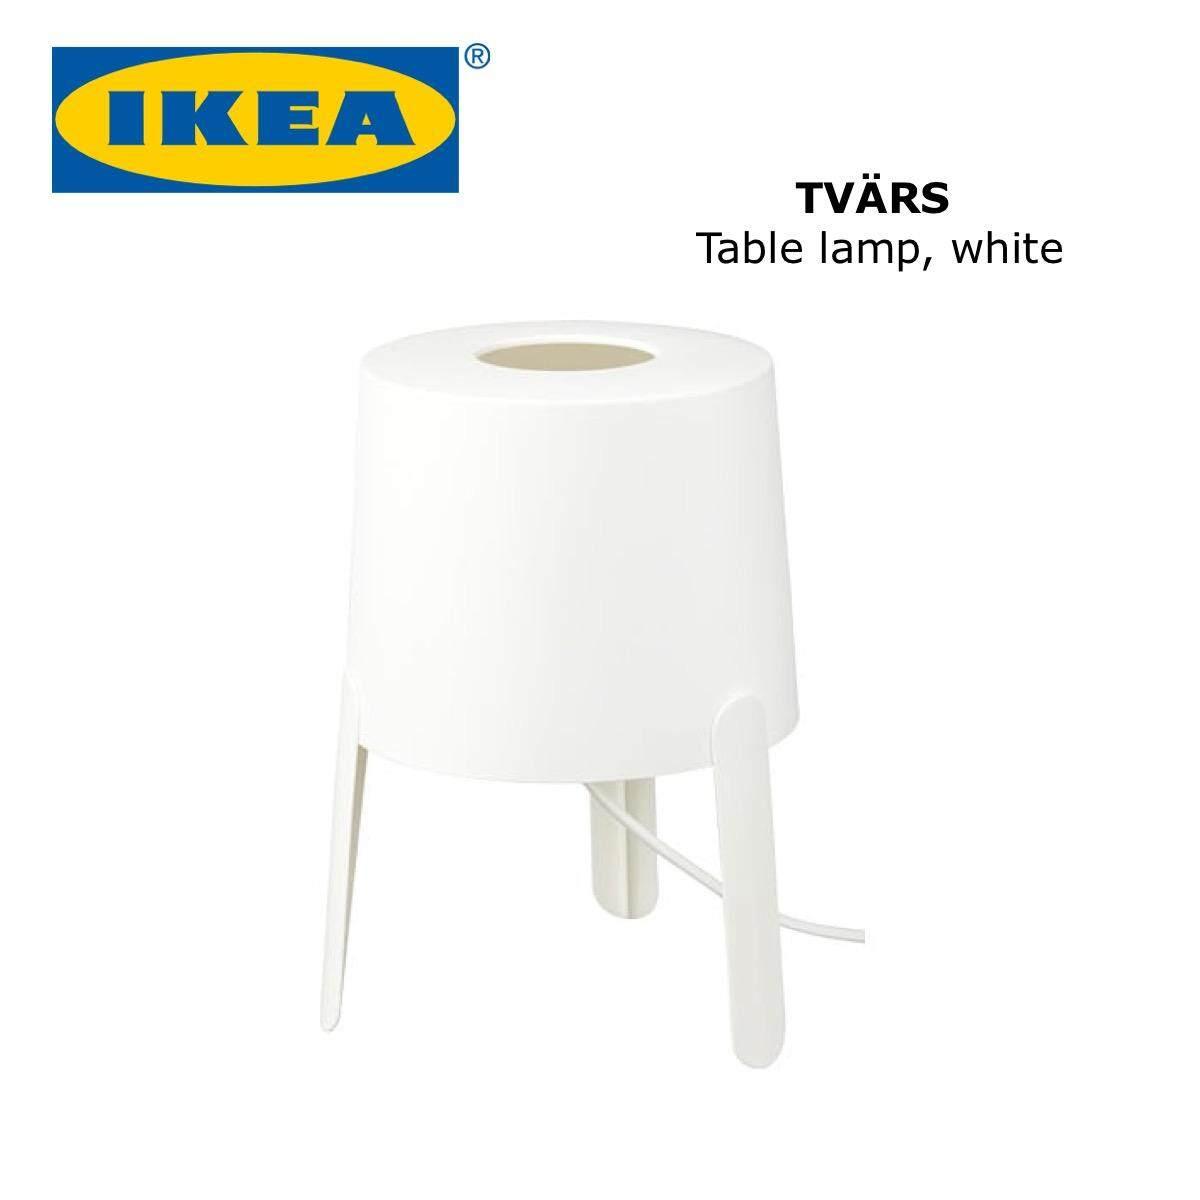 Ikea Lampu Meja Price In Malaysia Best Ikea Lampu Meja